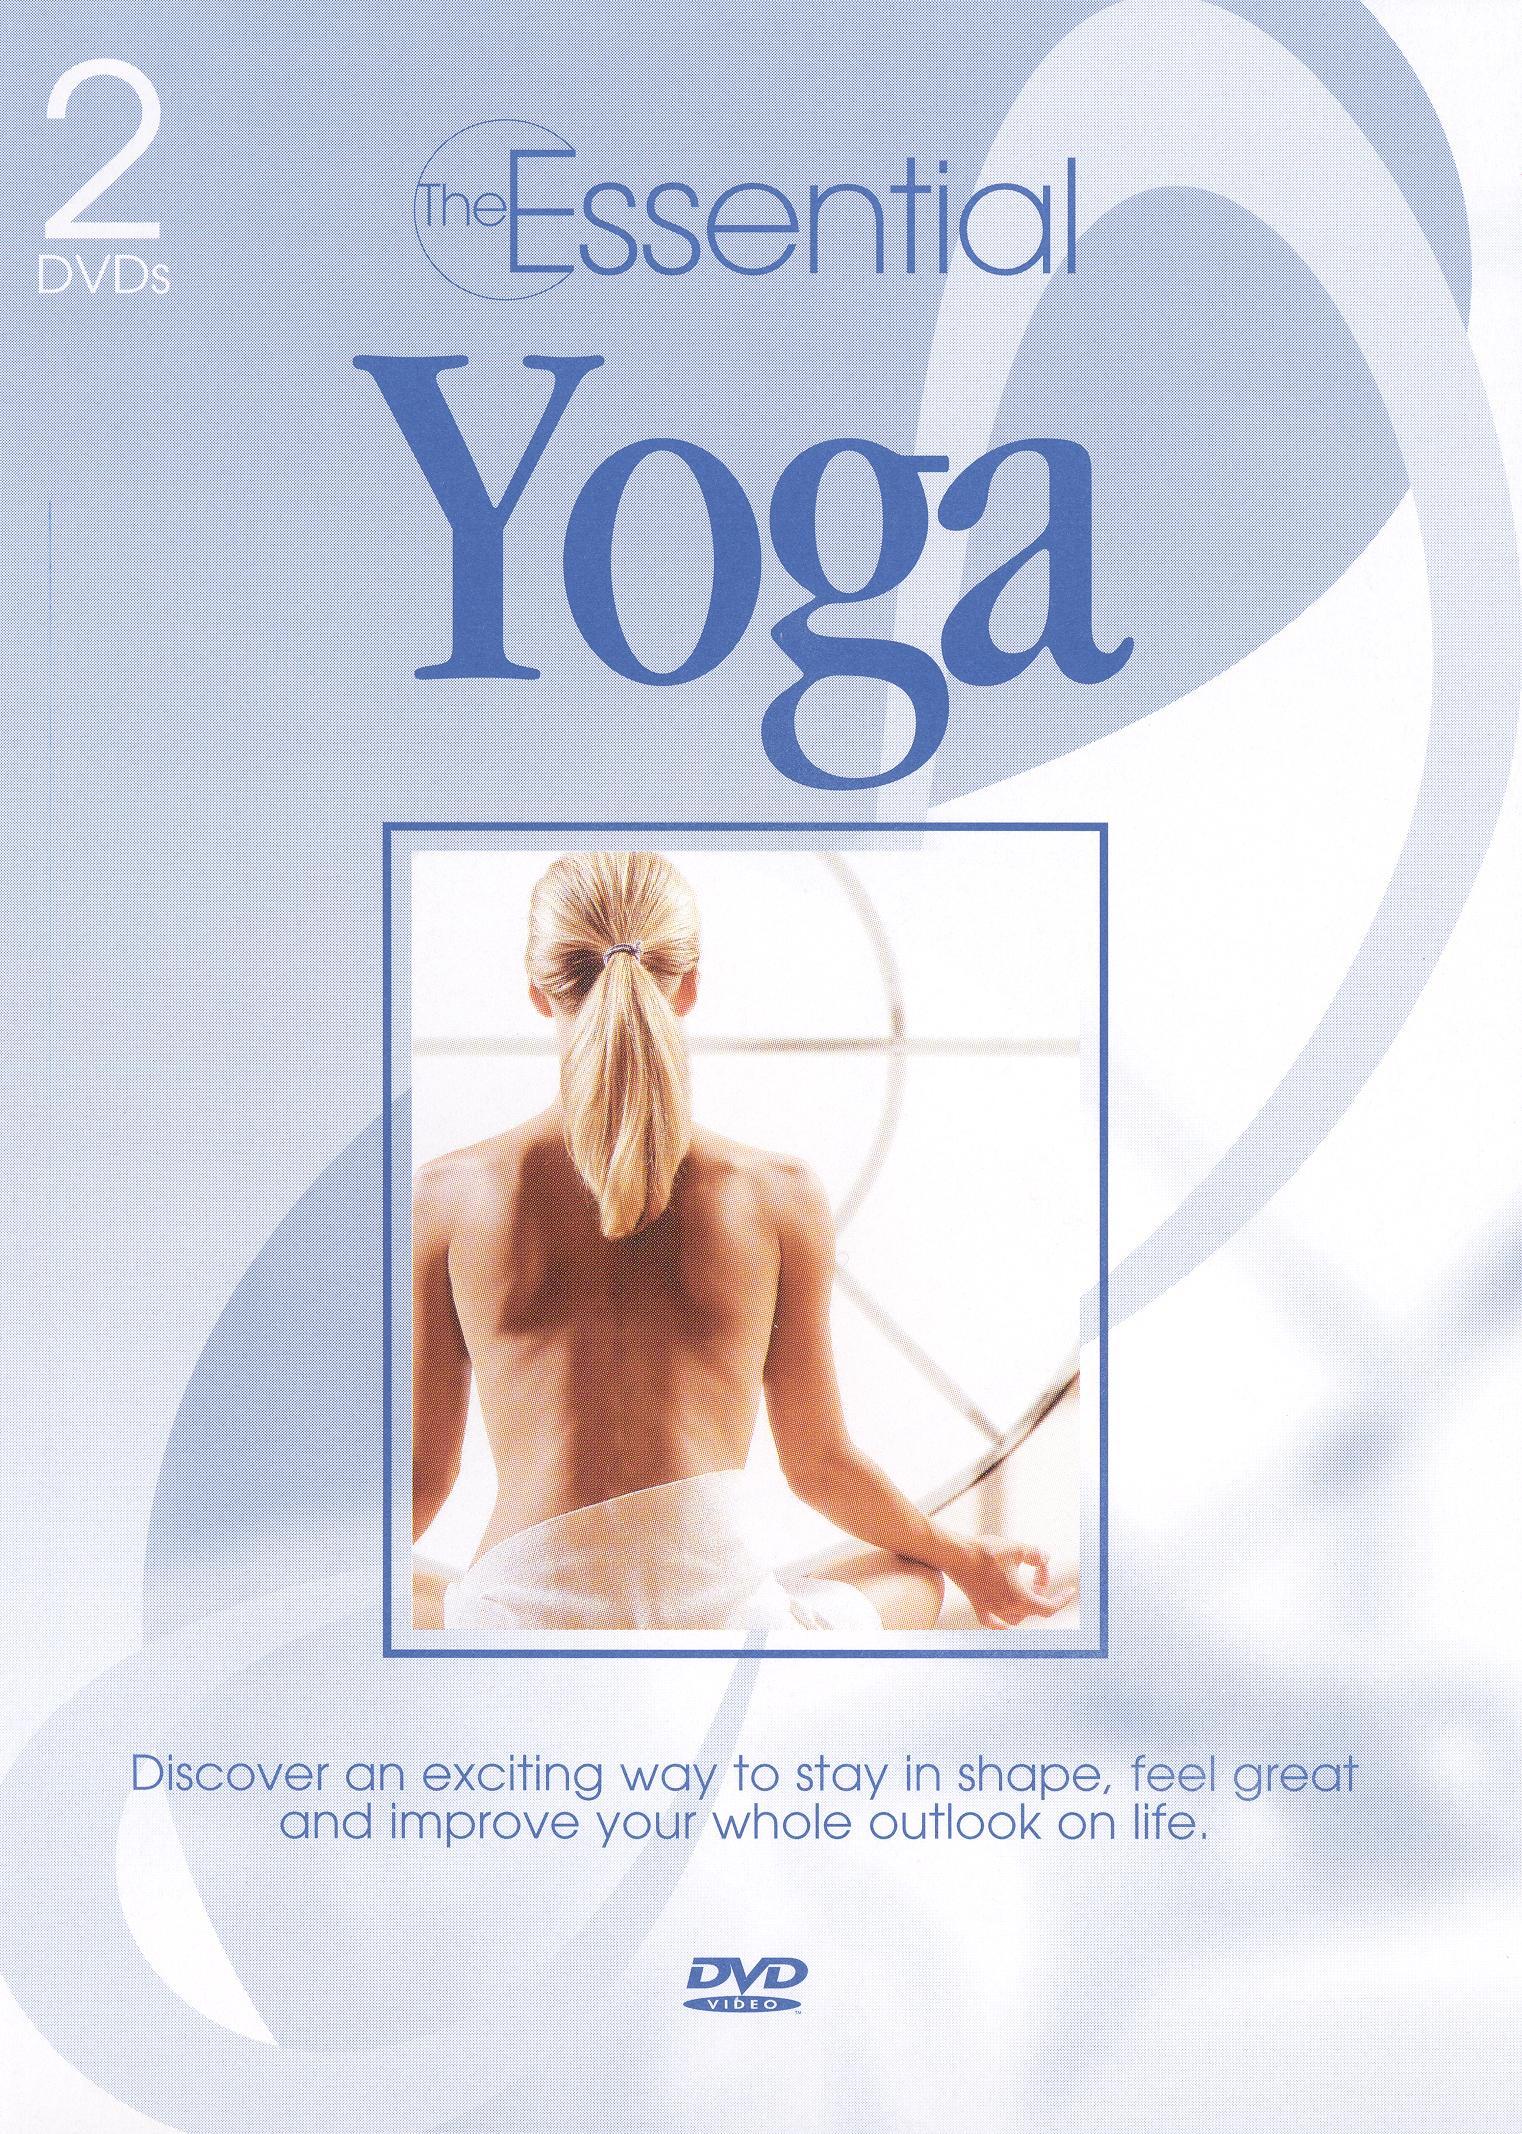 The Essential Yoga